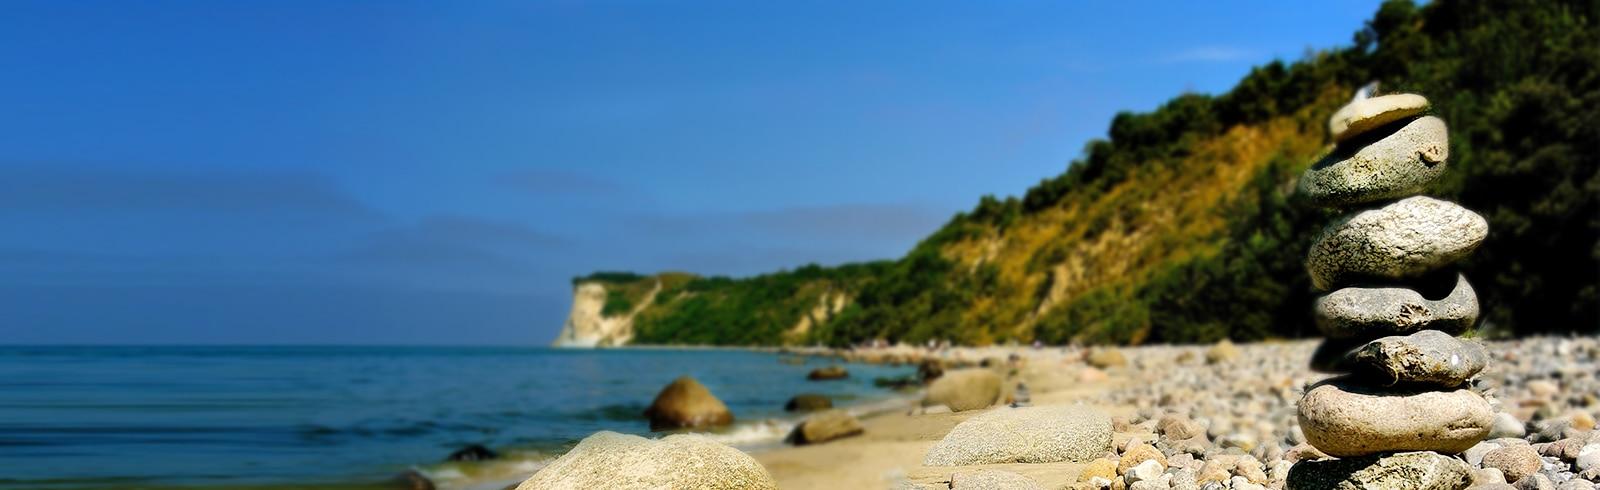 Wrap products mastehad stones pebbles nature mountain sea sky